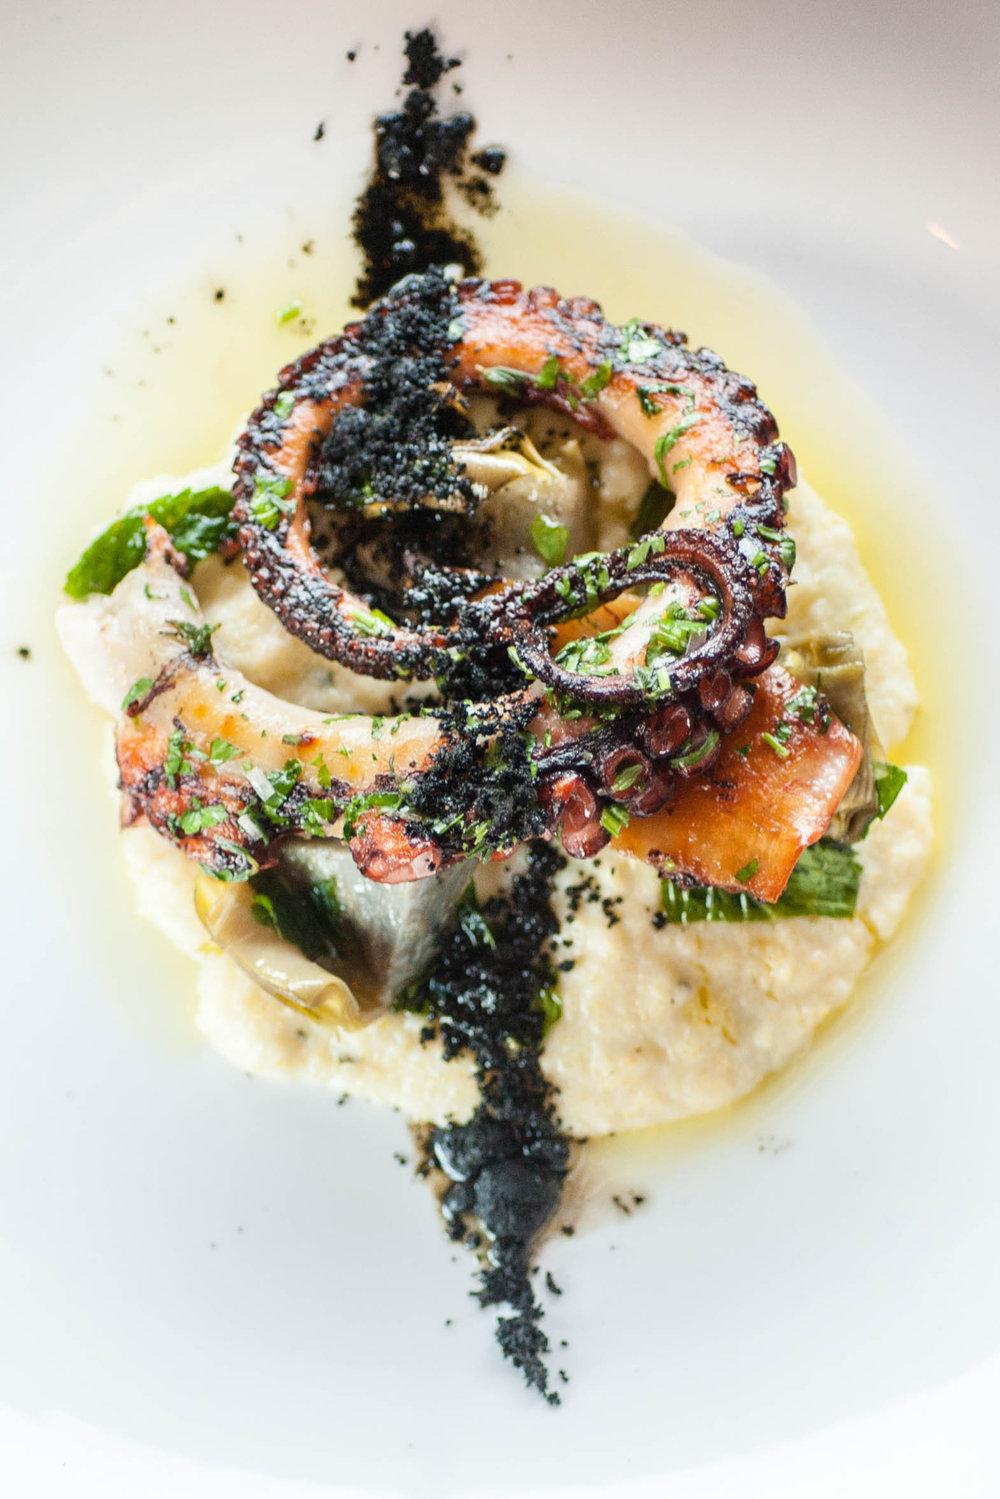 Octopus in Rochester